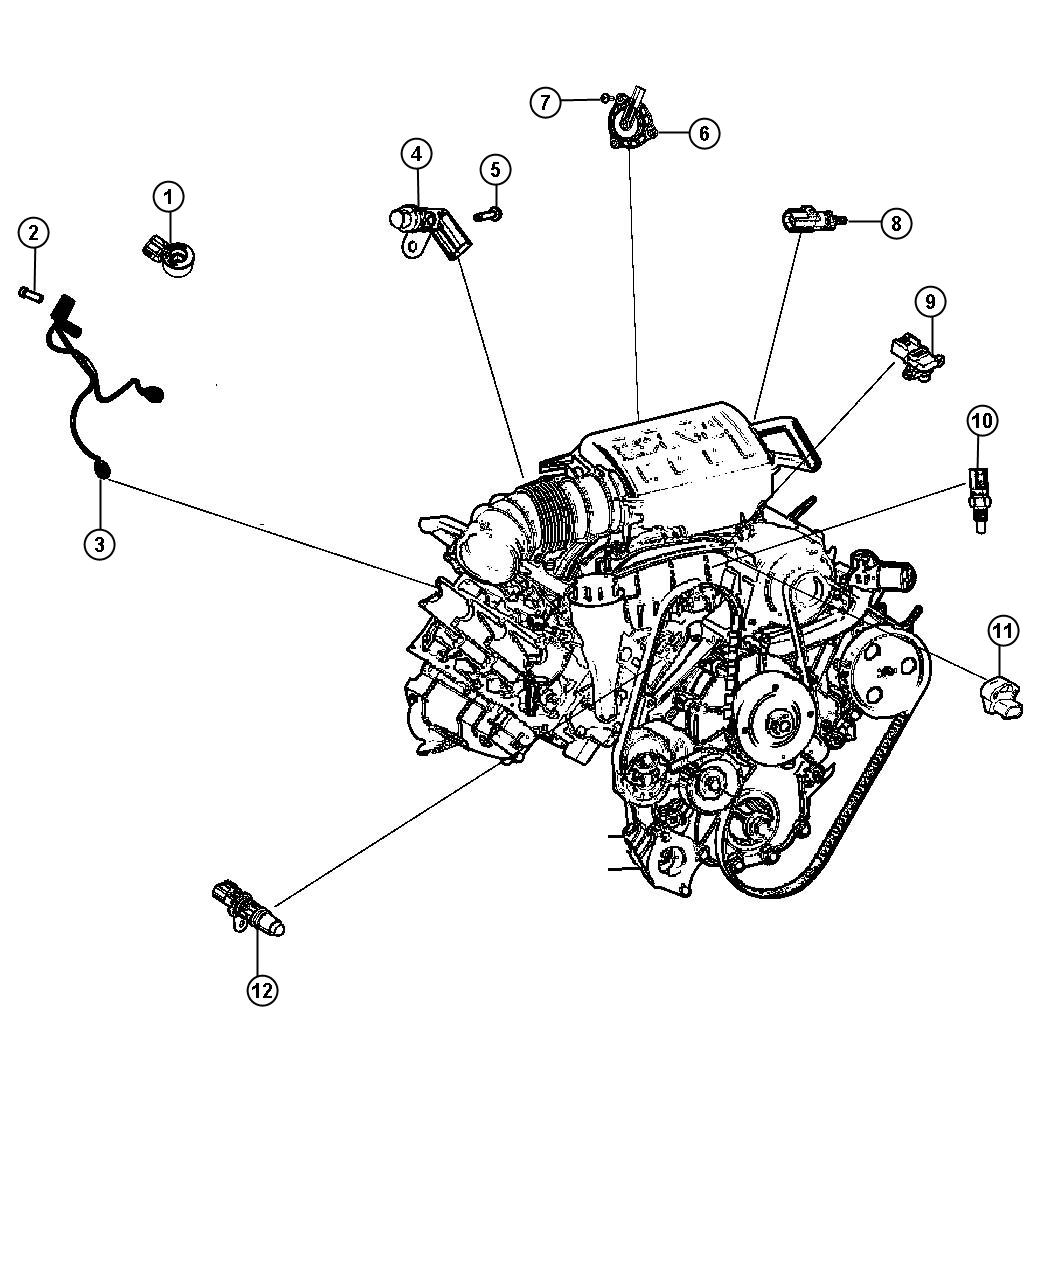 Dodge Grand Caravan Sensor Crankshaft Position Engine